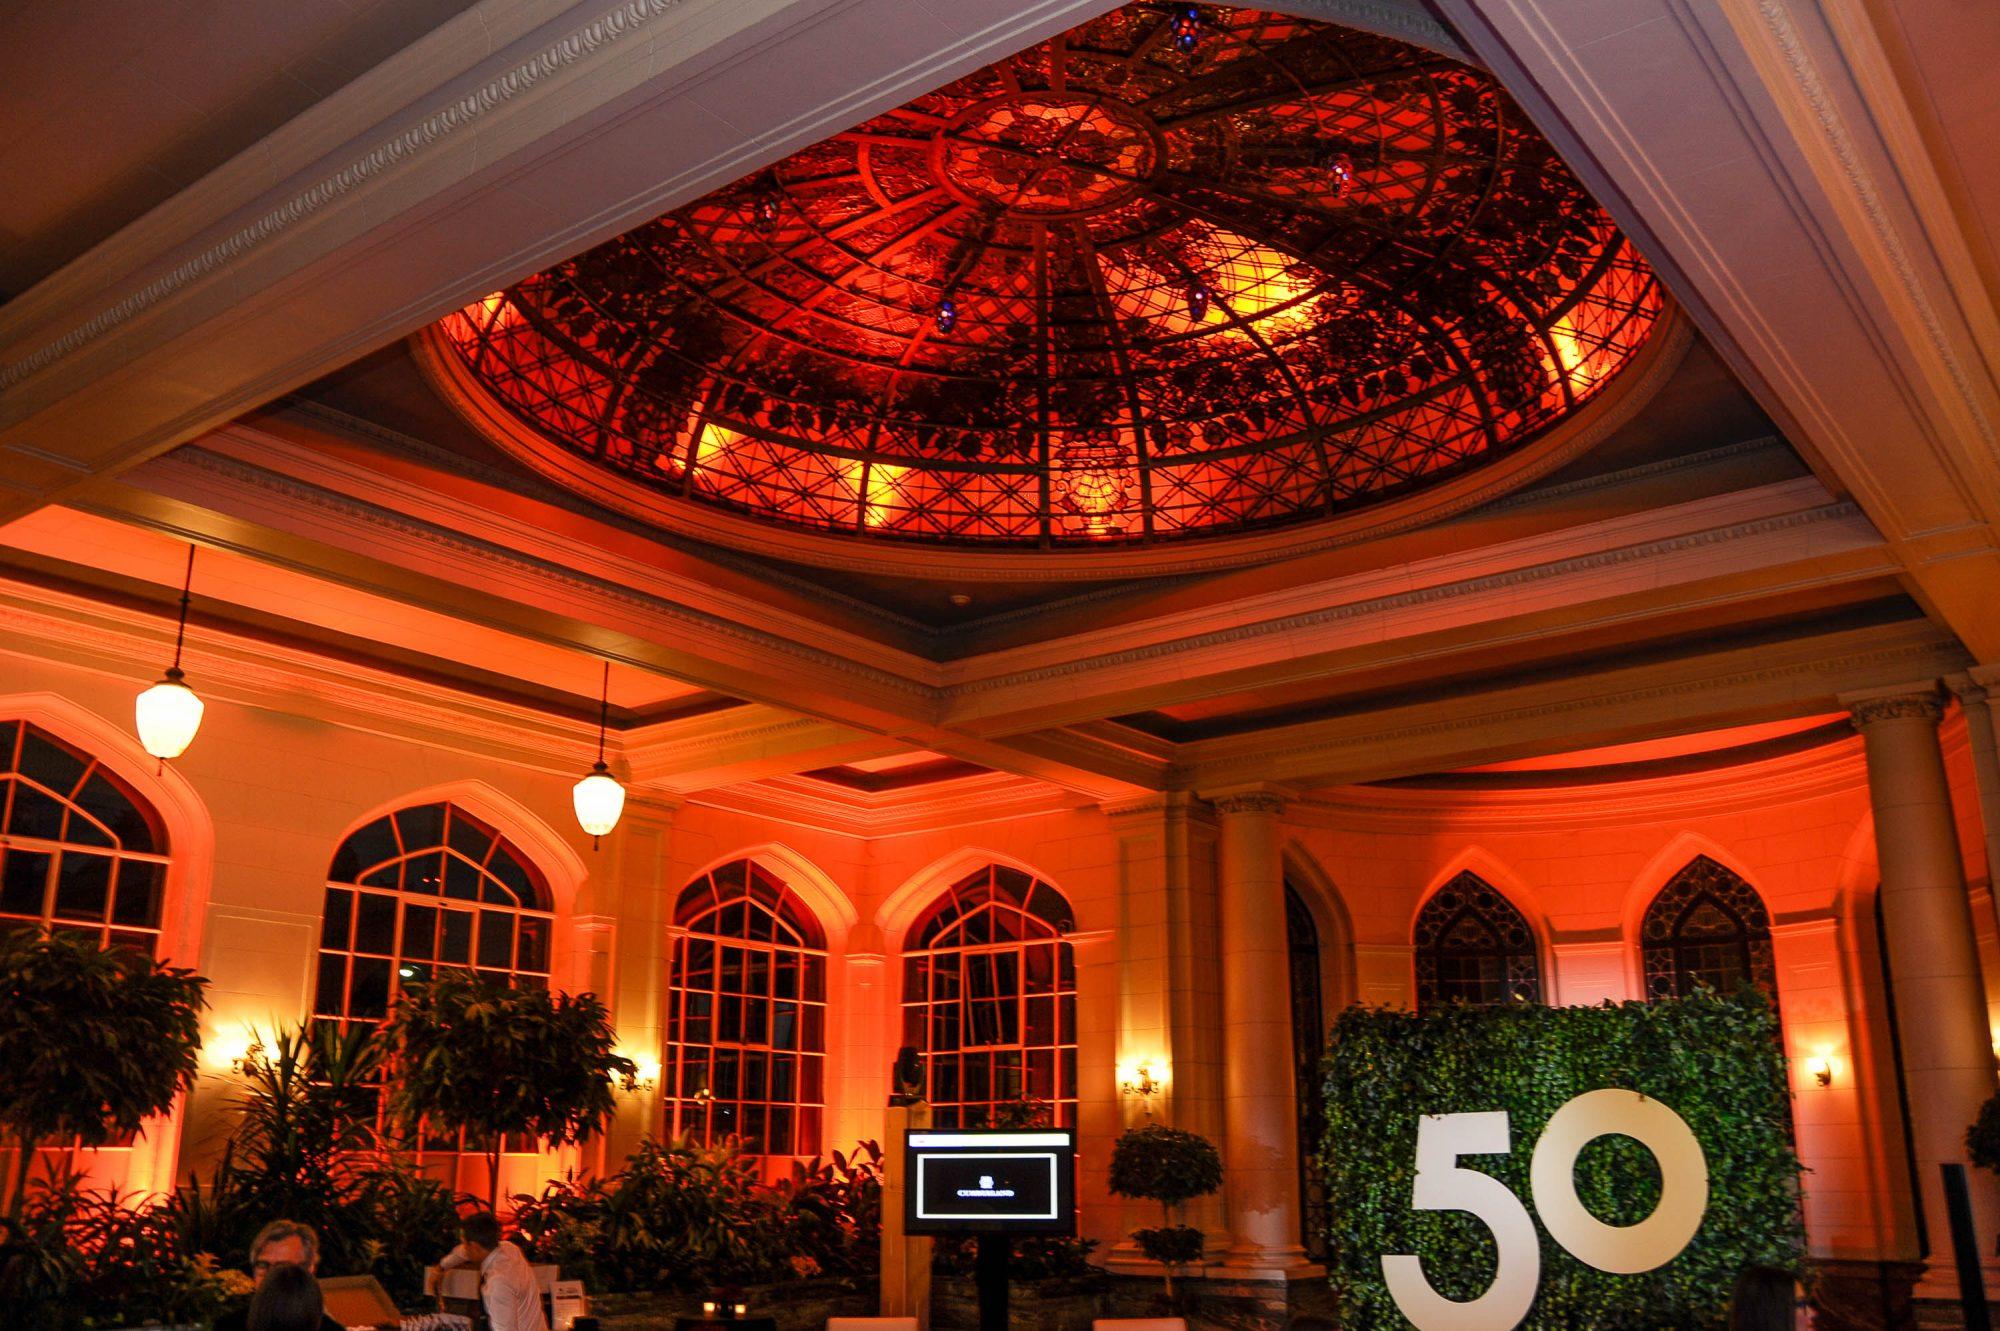 Toronto_Life_50th_Anniversary_Che_Rosales_LARAWAN-1134